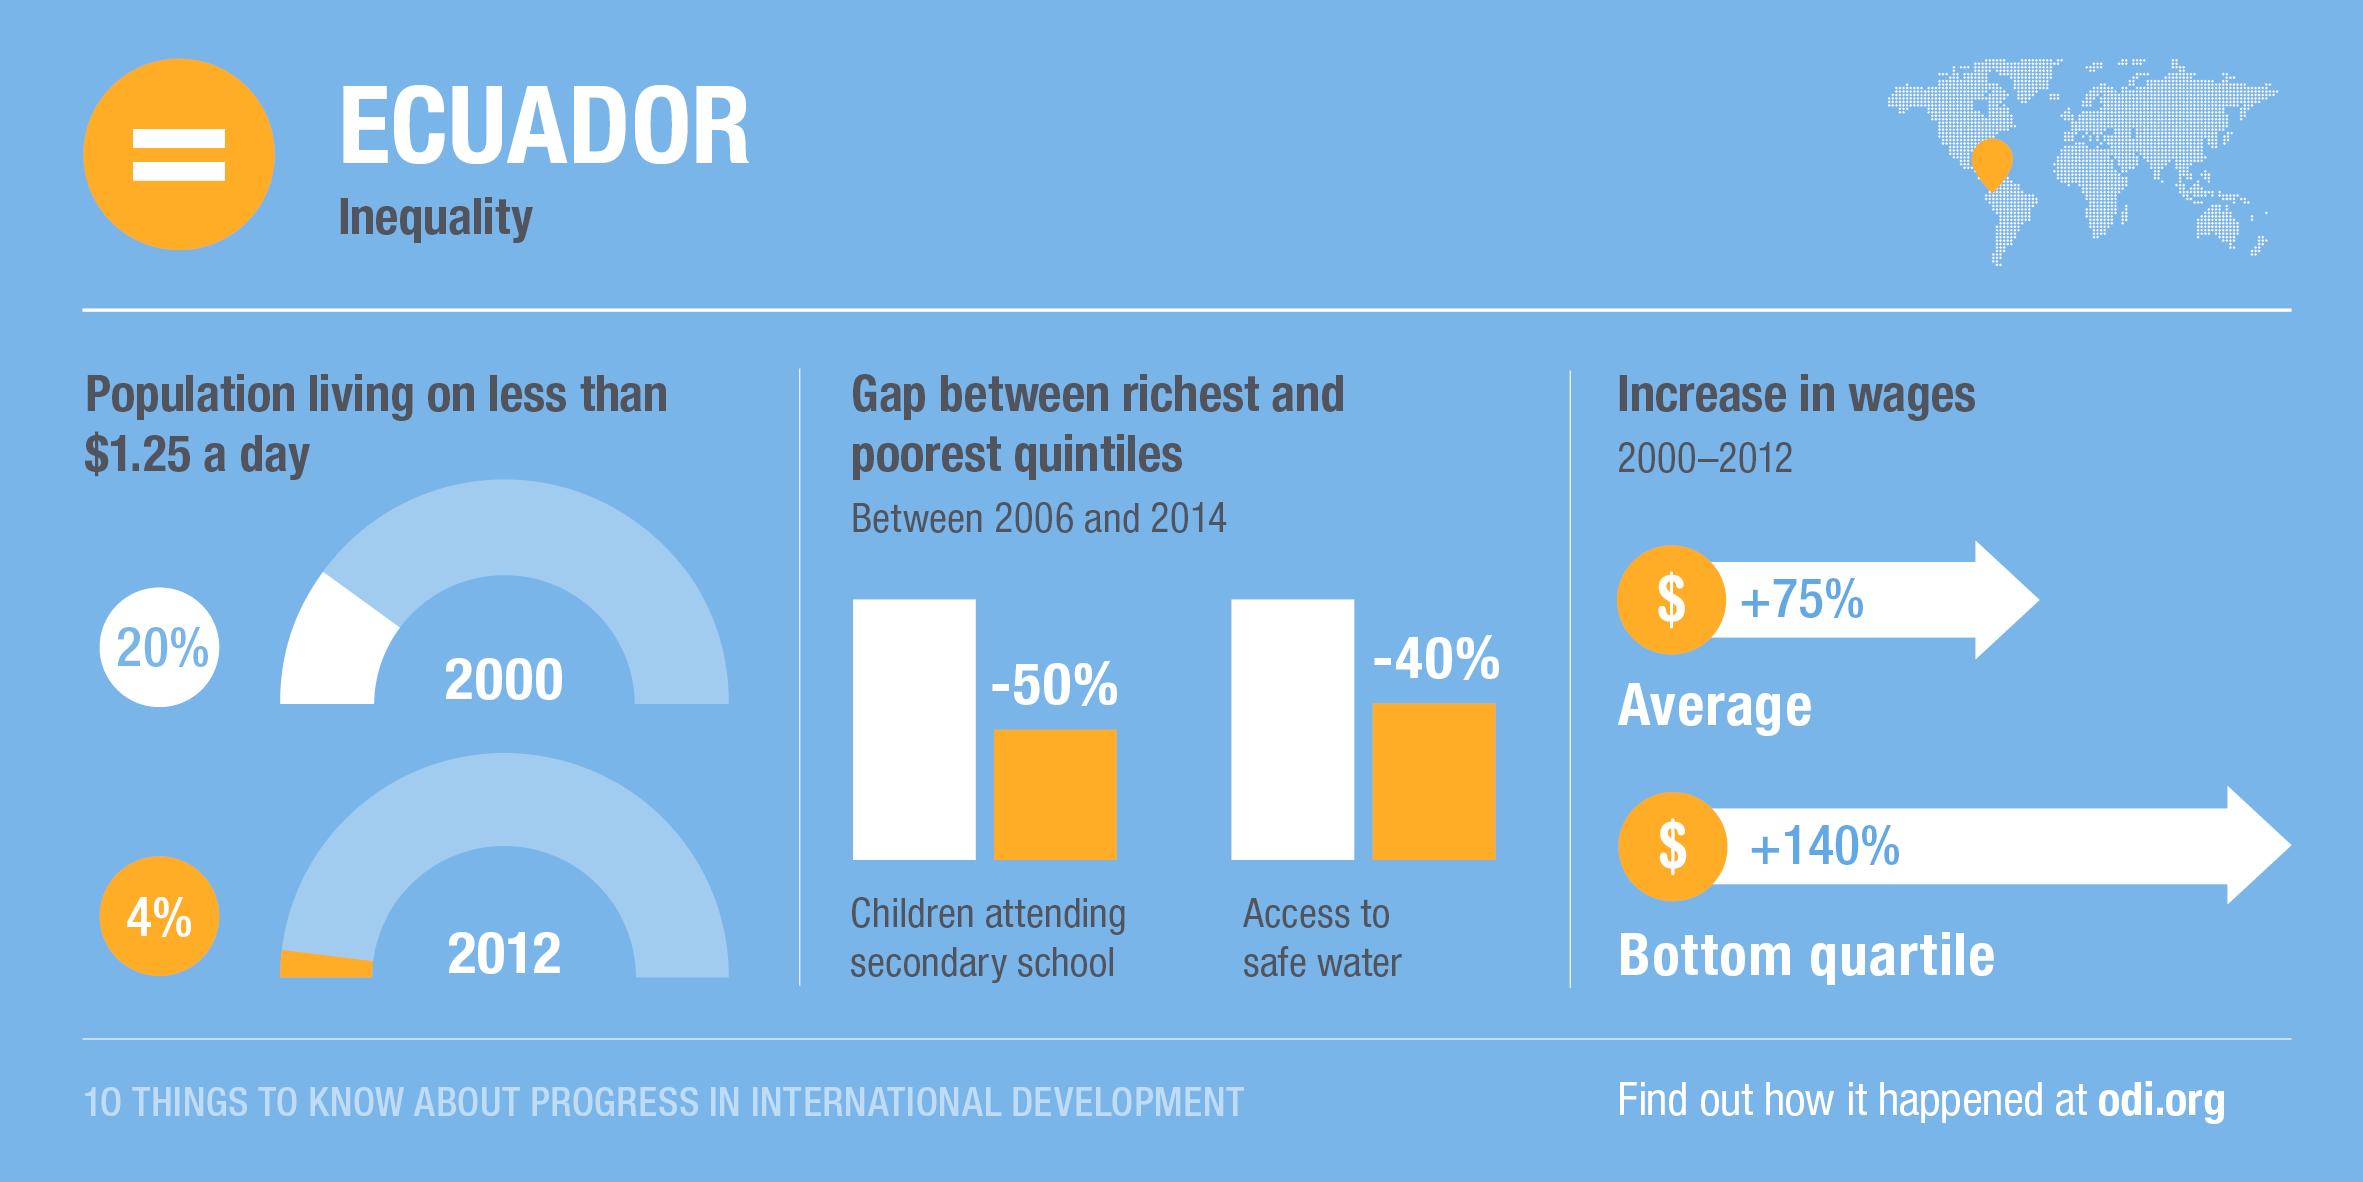 Ecuador's progress on poverty